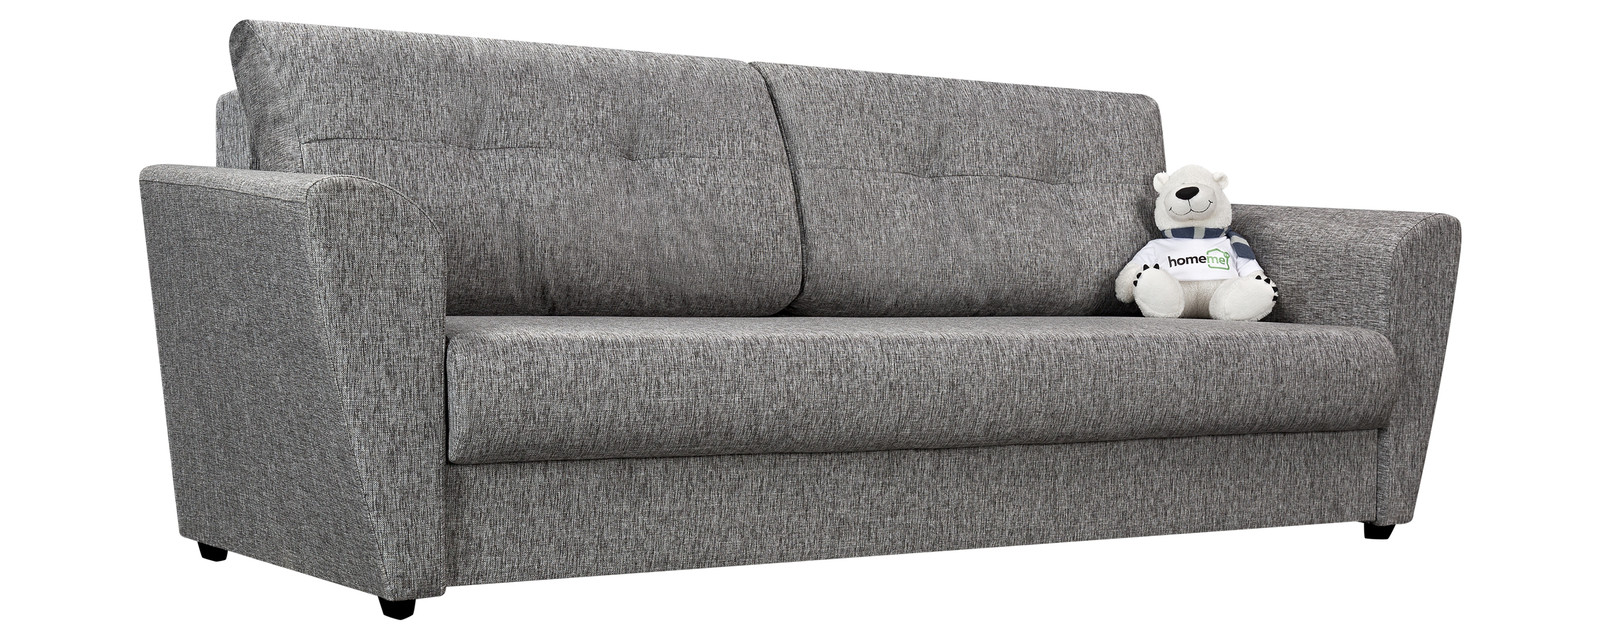 Диван прямой HomeMe Амстердам тканевый (Ткань: Madagascar серый, Рогожка)